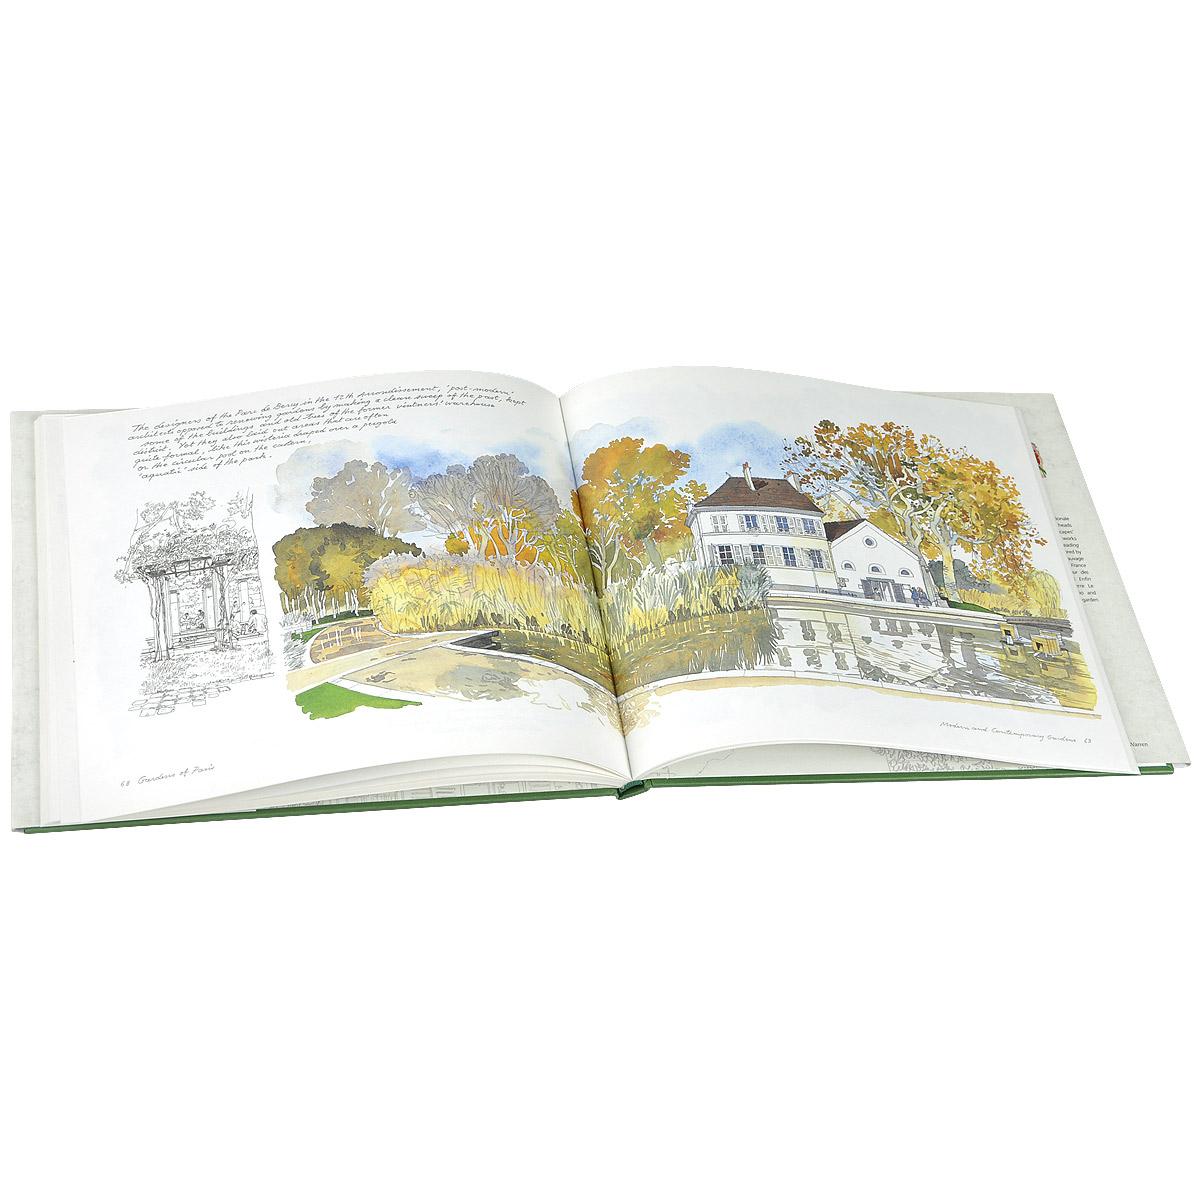 Gardens of Paris: Sketchbook